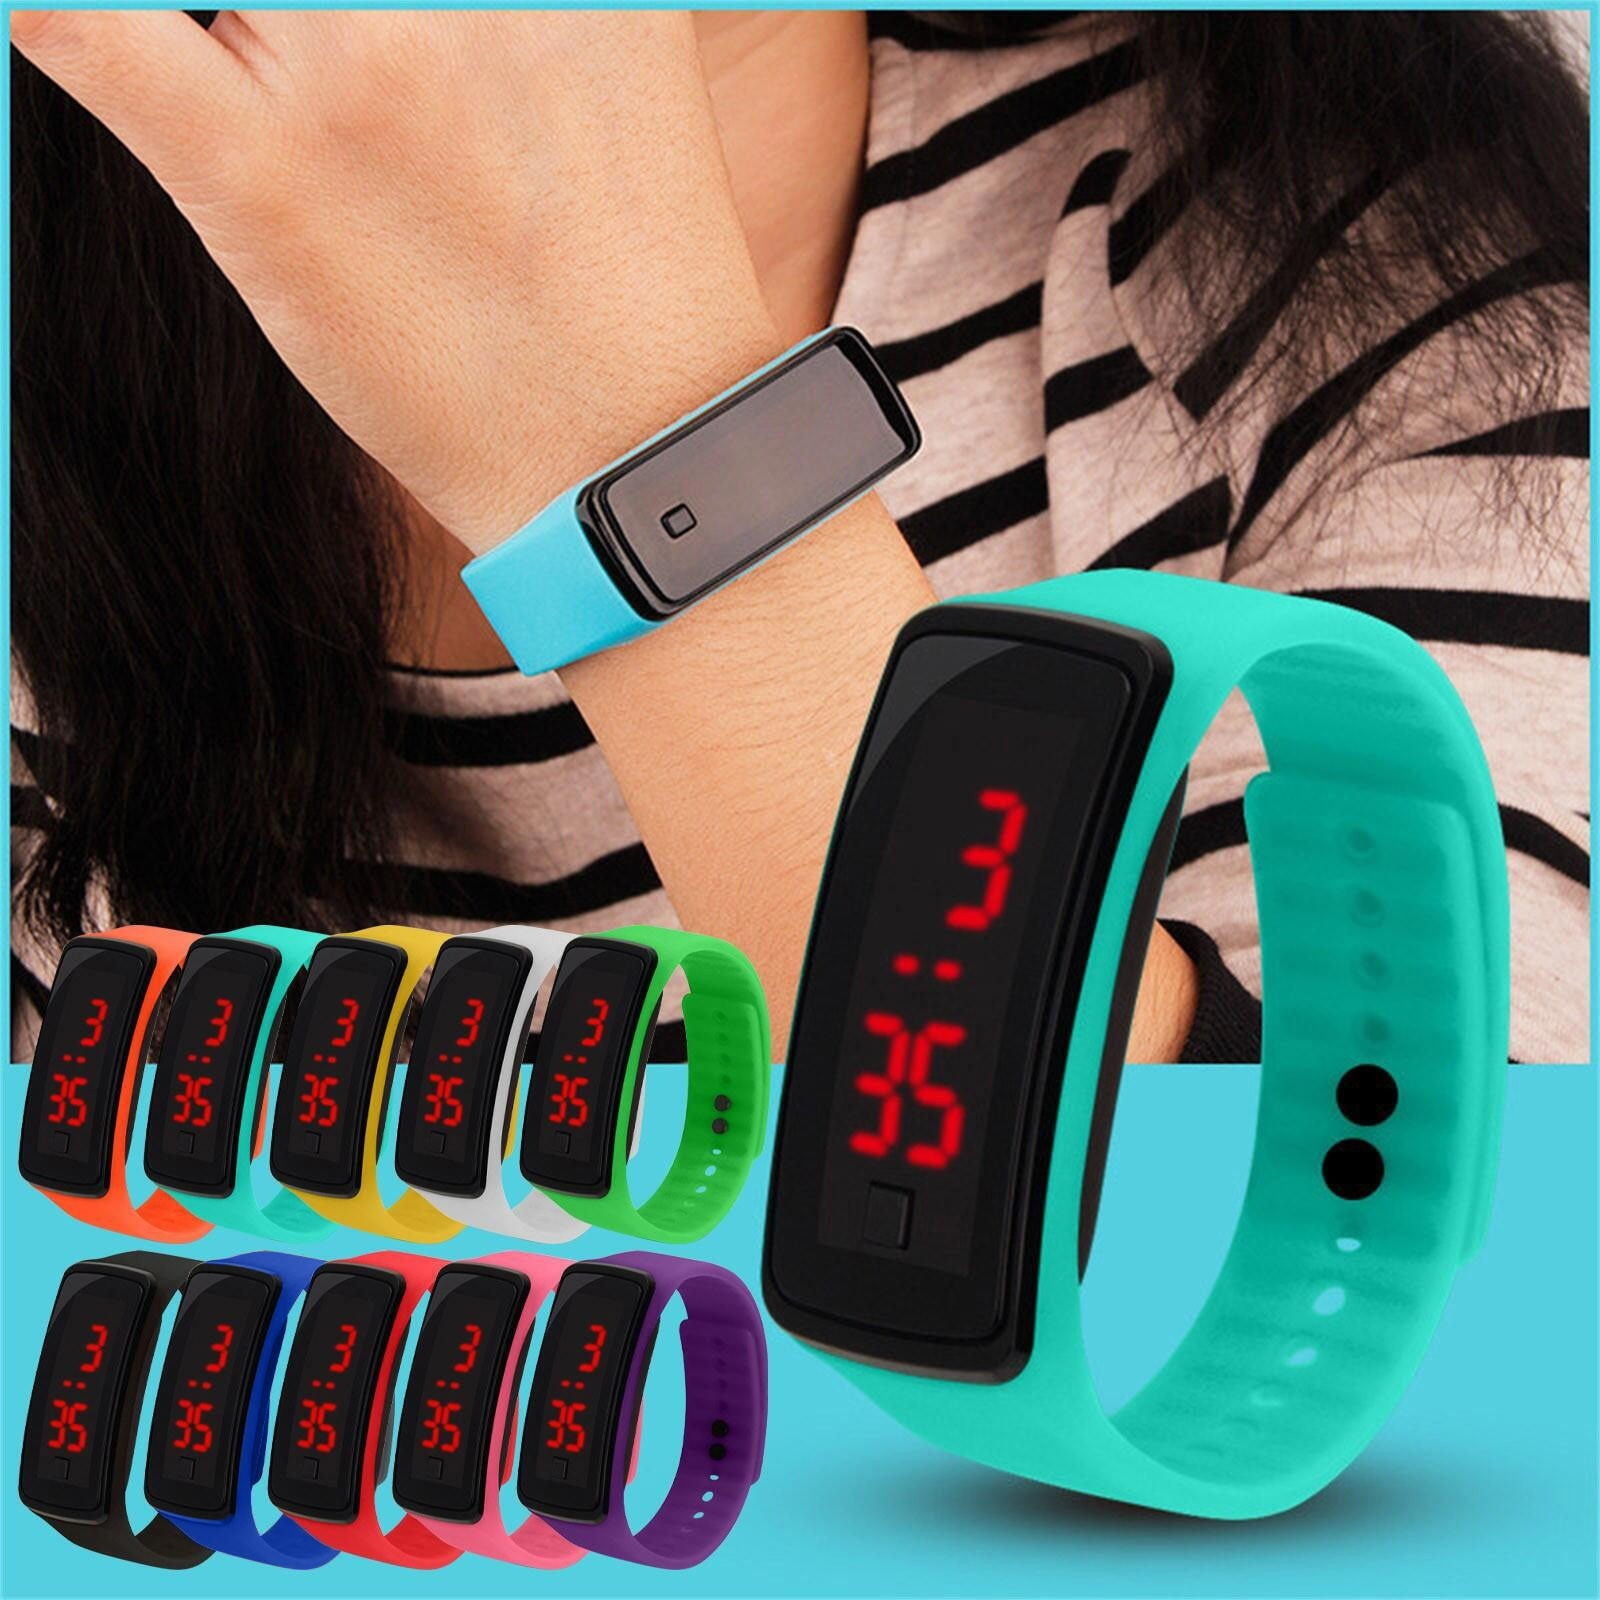 Child Watches New LED Digital Wrist Watch Bracelet Kids Outdoor Sports Watch For Boys Girls Electron